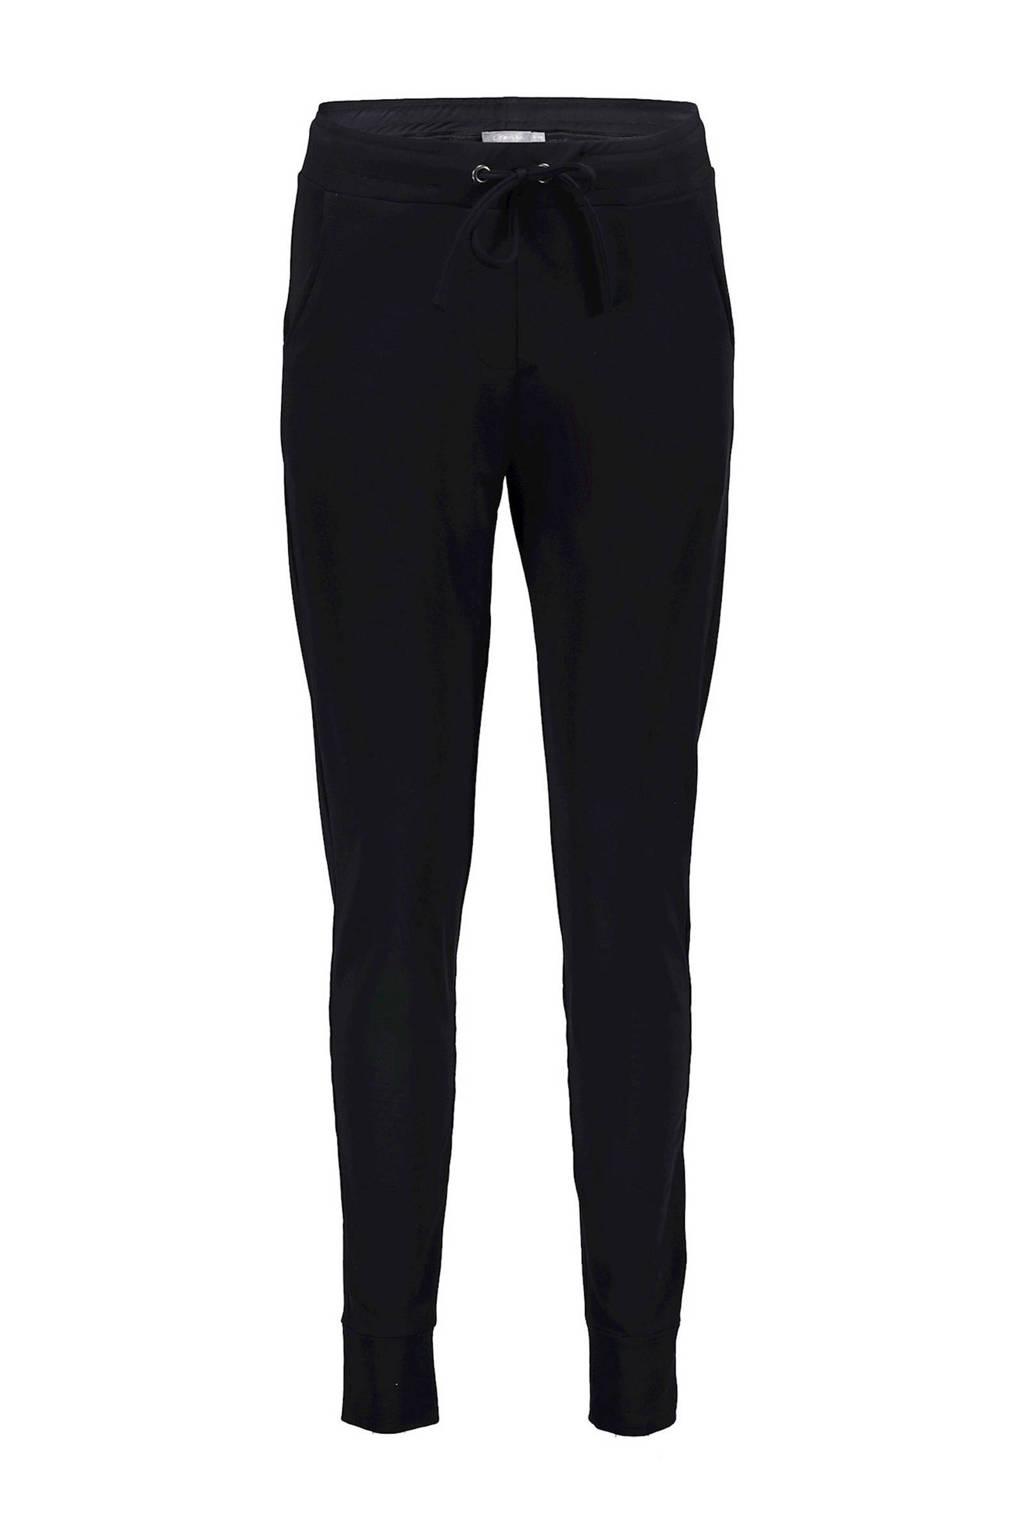 Geisha slim fit joggingbroek zwart, Zwart